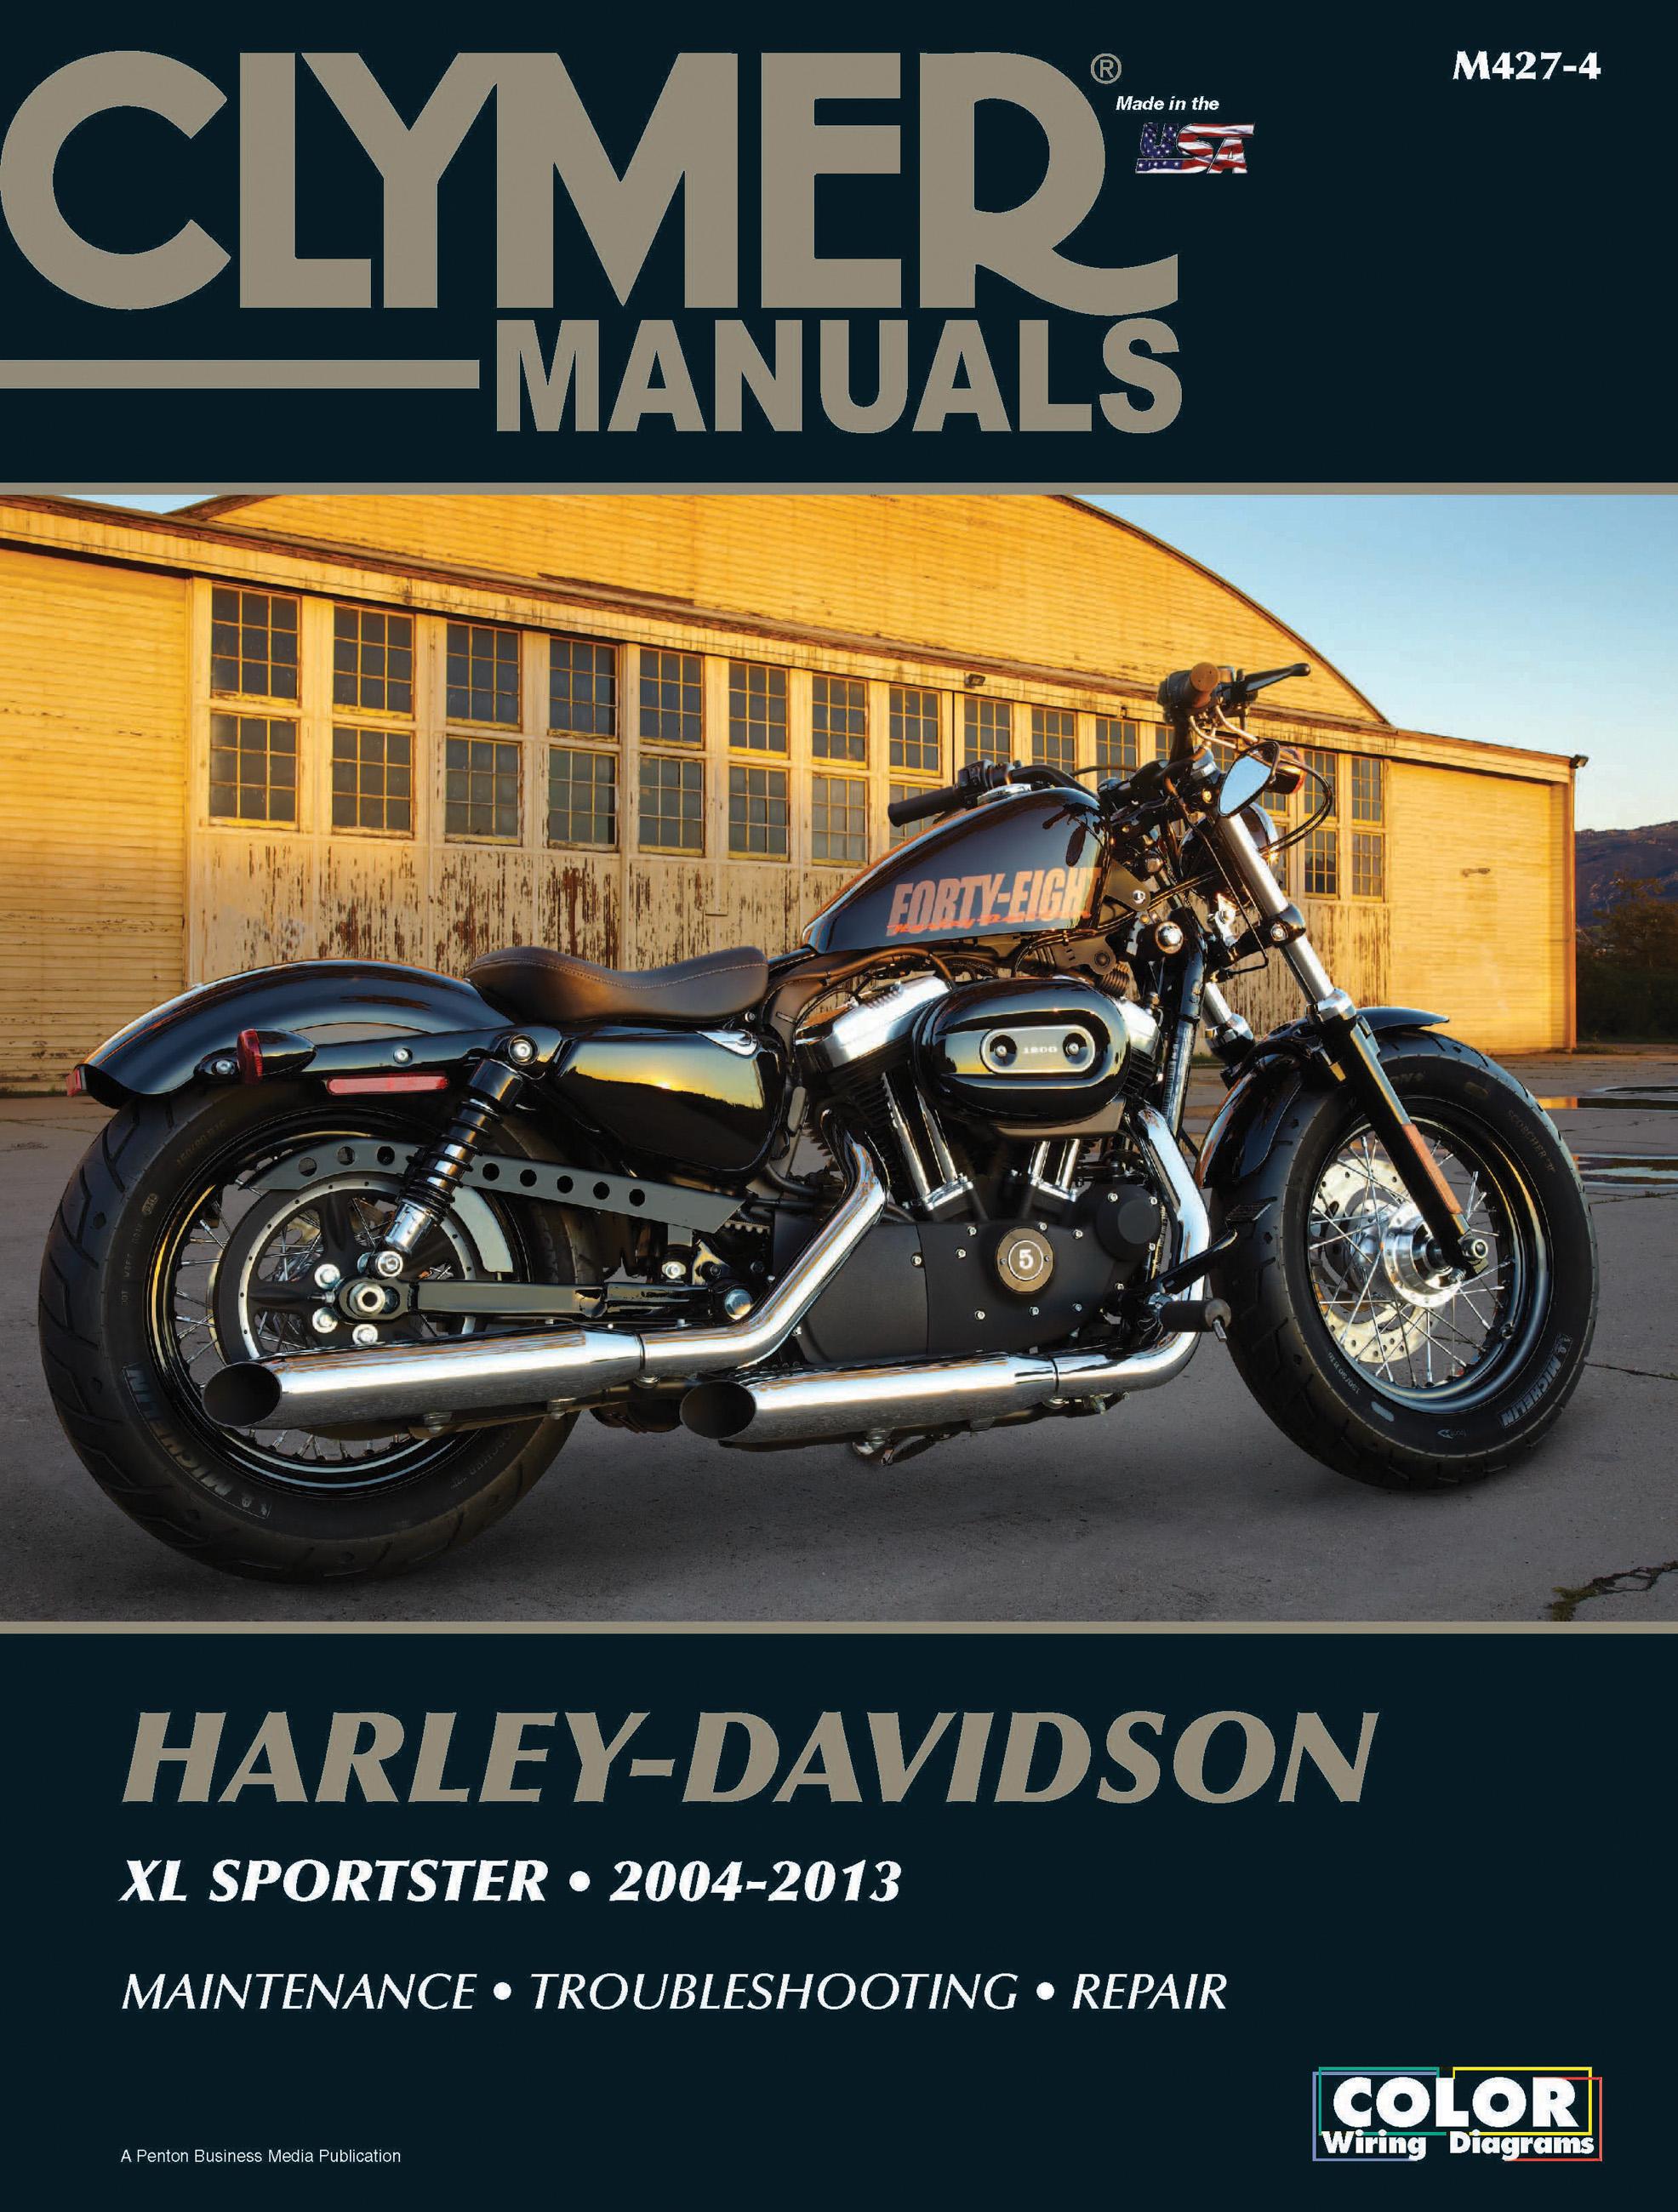 Clymer Workshop Manual Harley Davidson XL//XLH Sportster 1986-2003 Service Repair